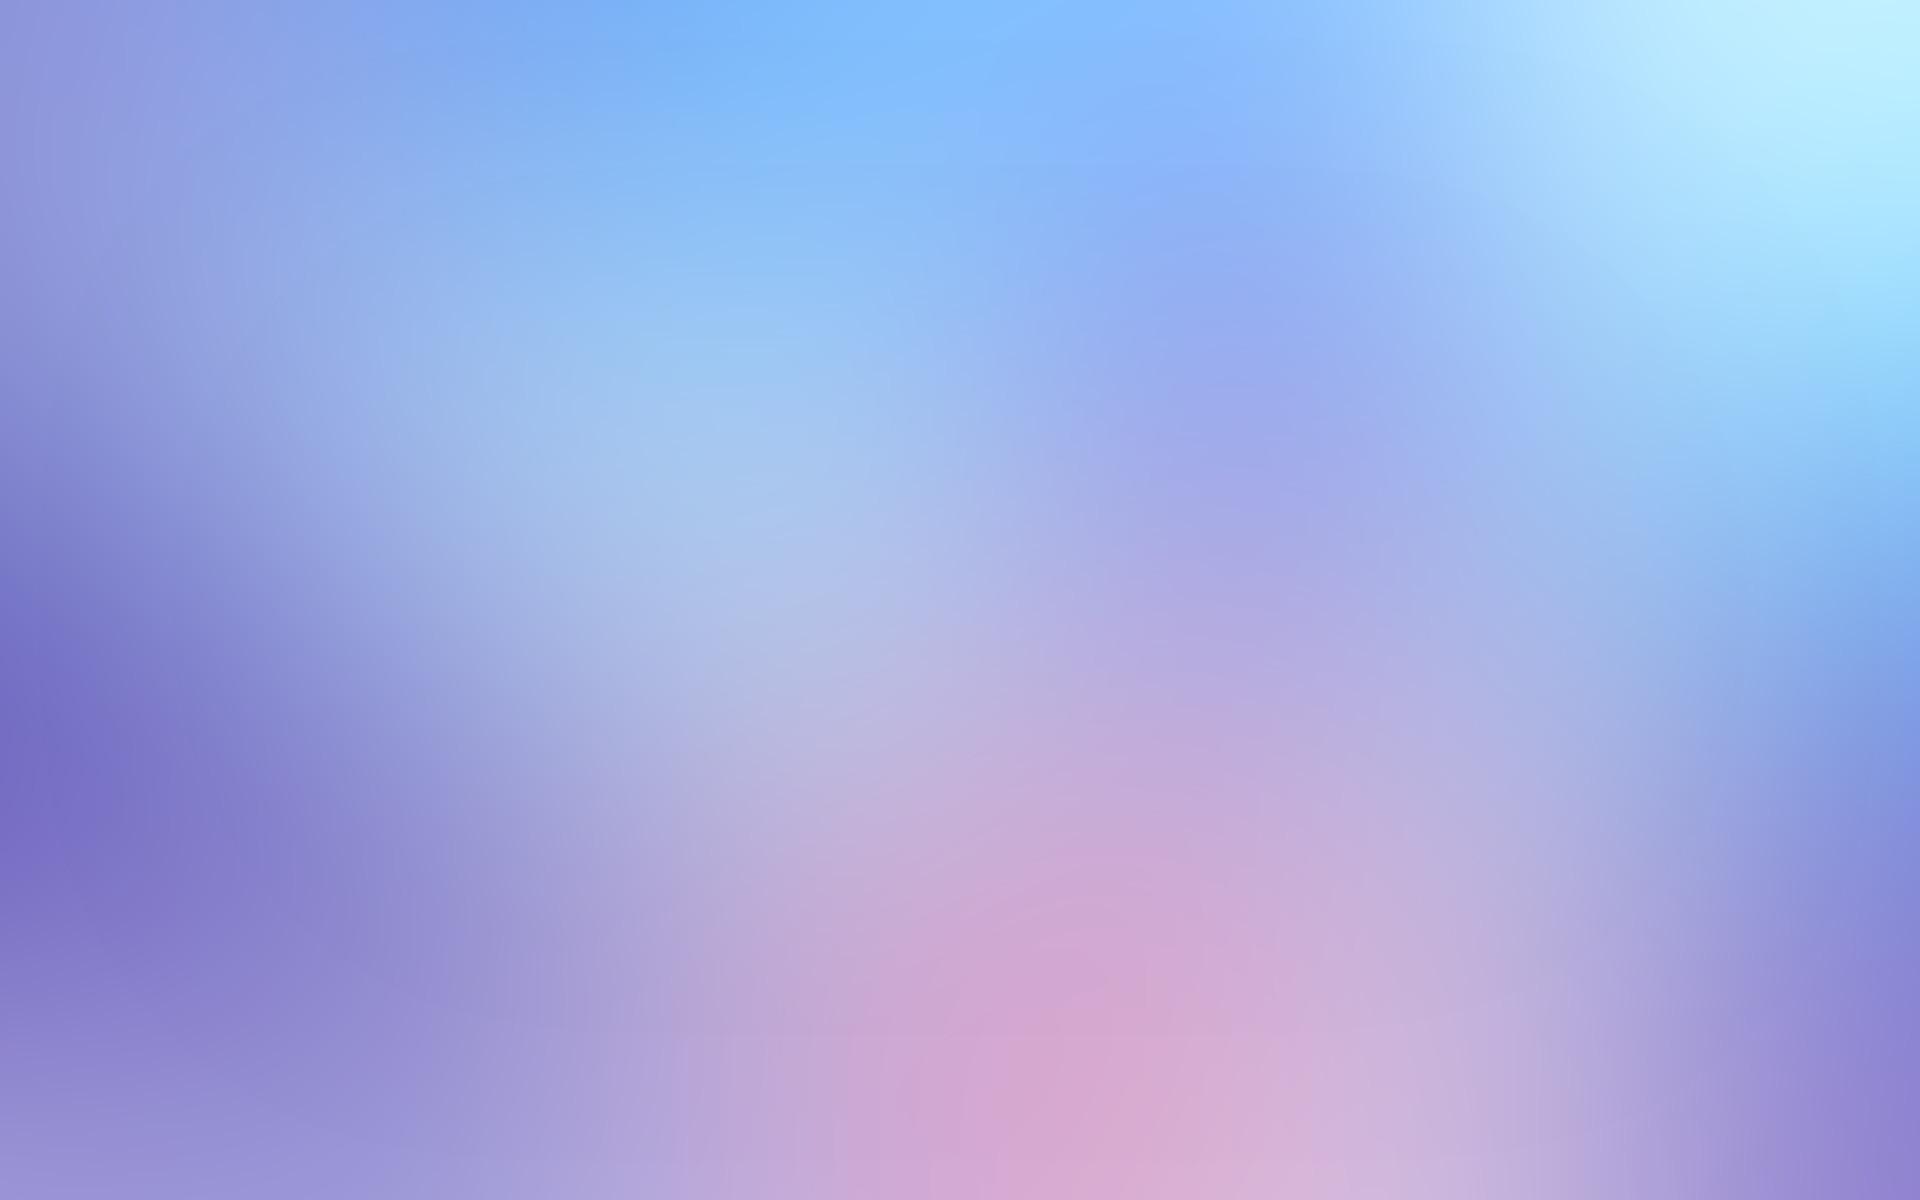 Light gradient HD Wallpaper 1920×1080 Light gradient HD Wallpaper 1920×1200